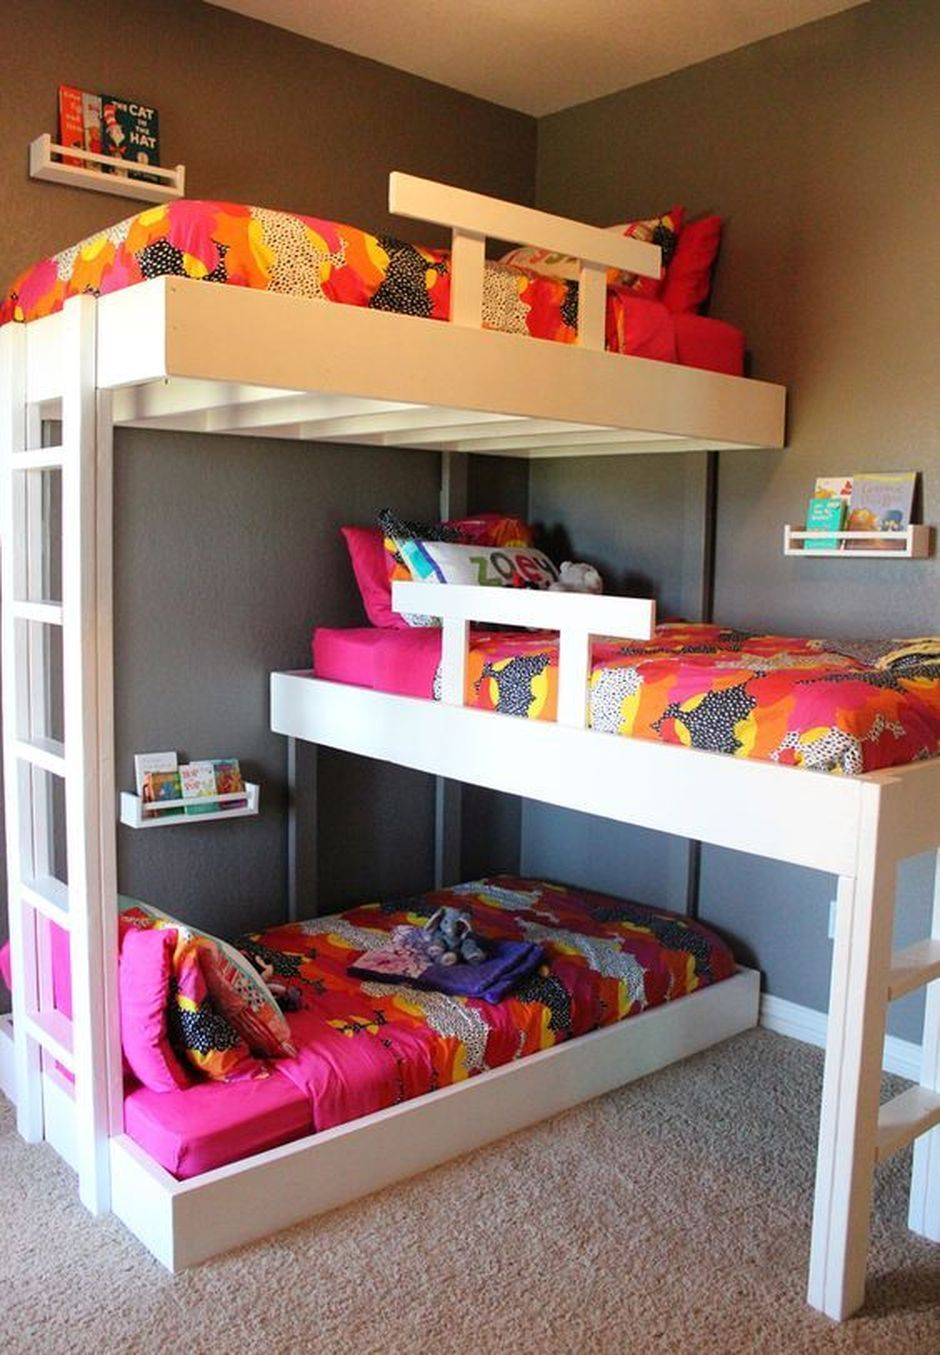 Loft bed design ideas  Cool Loft Bed Design Ideas for Small Room  Diseño Dormitorios